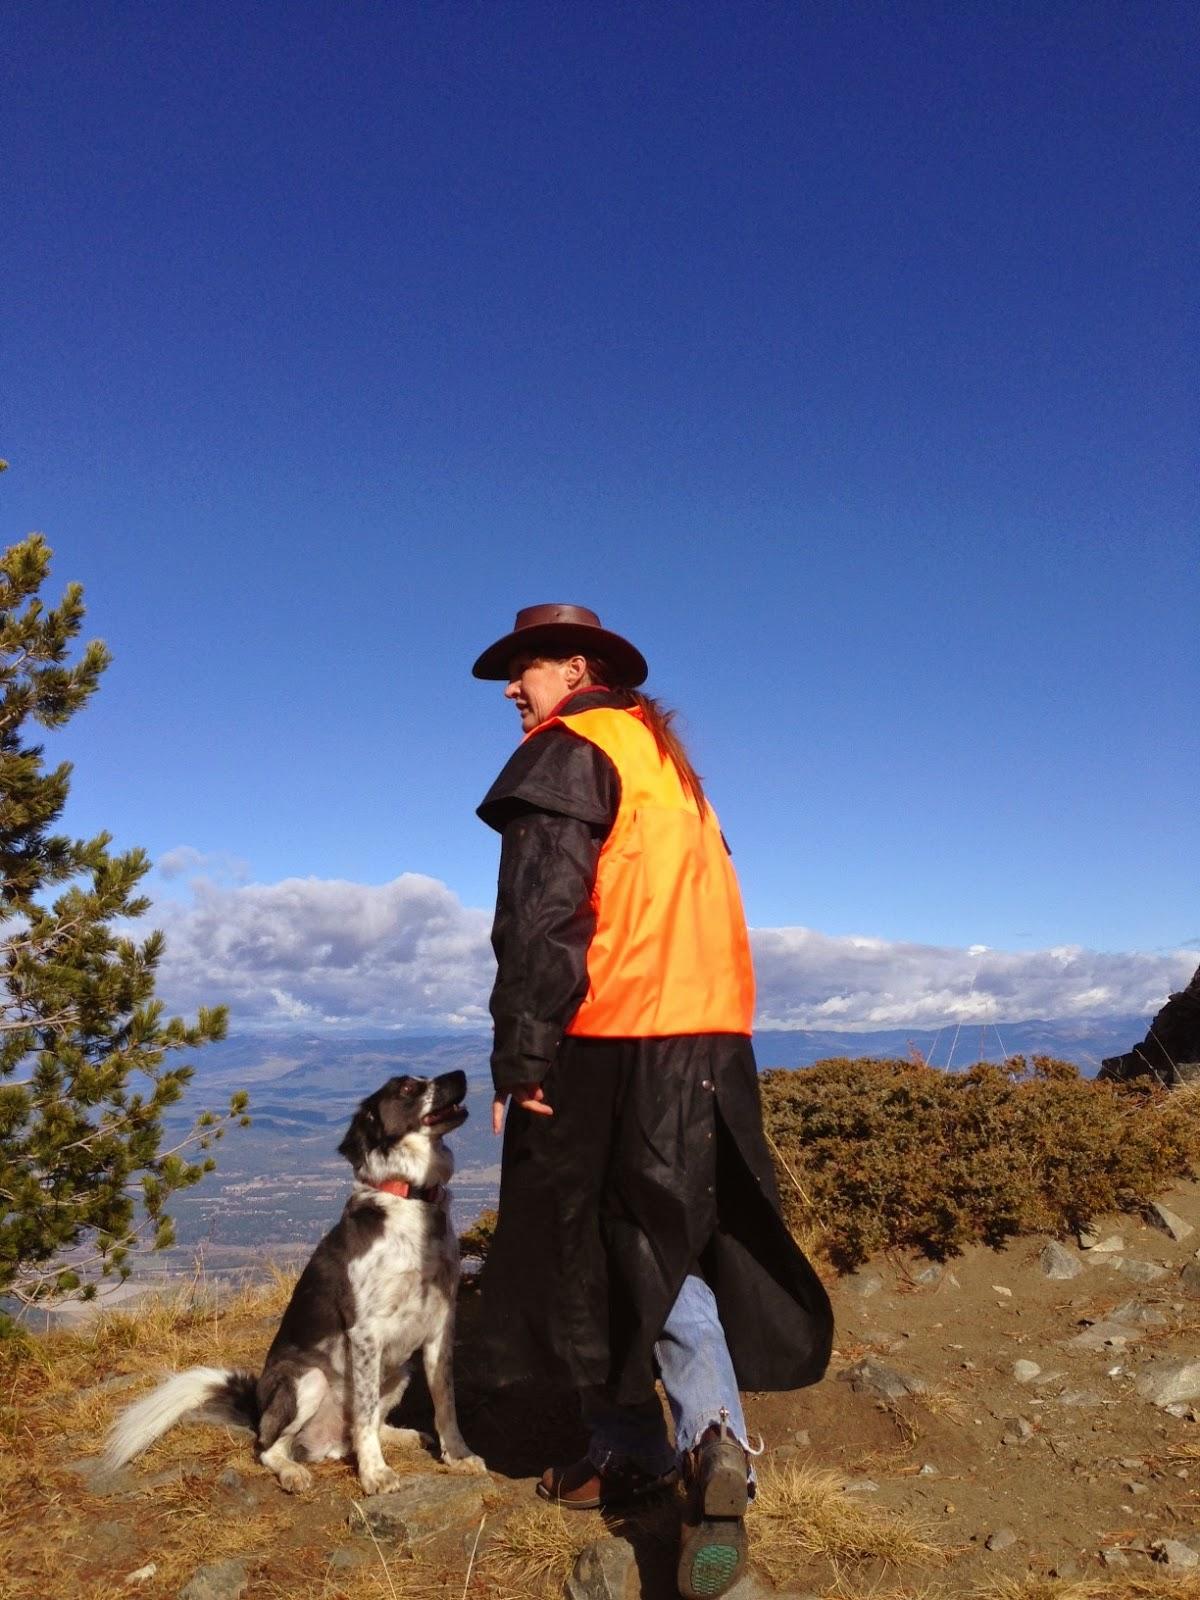 High Mountain Ridge, Idaho - 10/2104